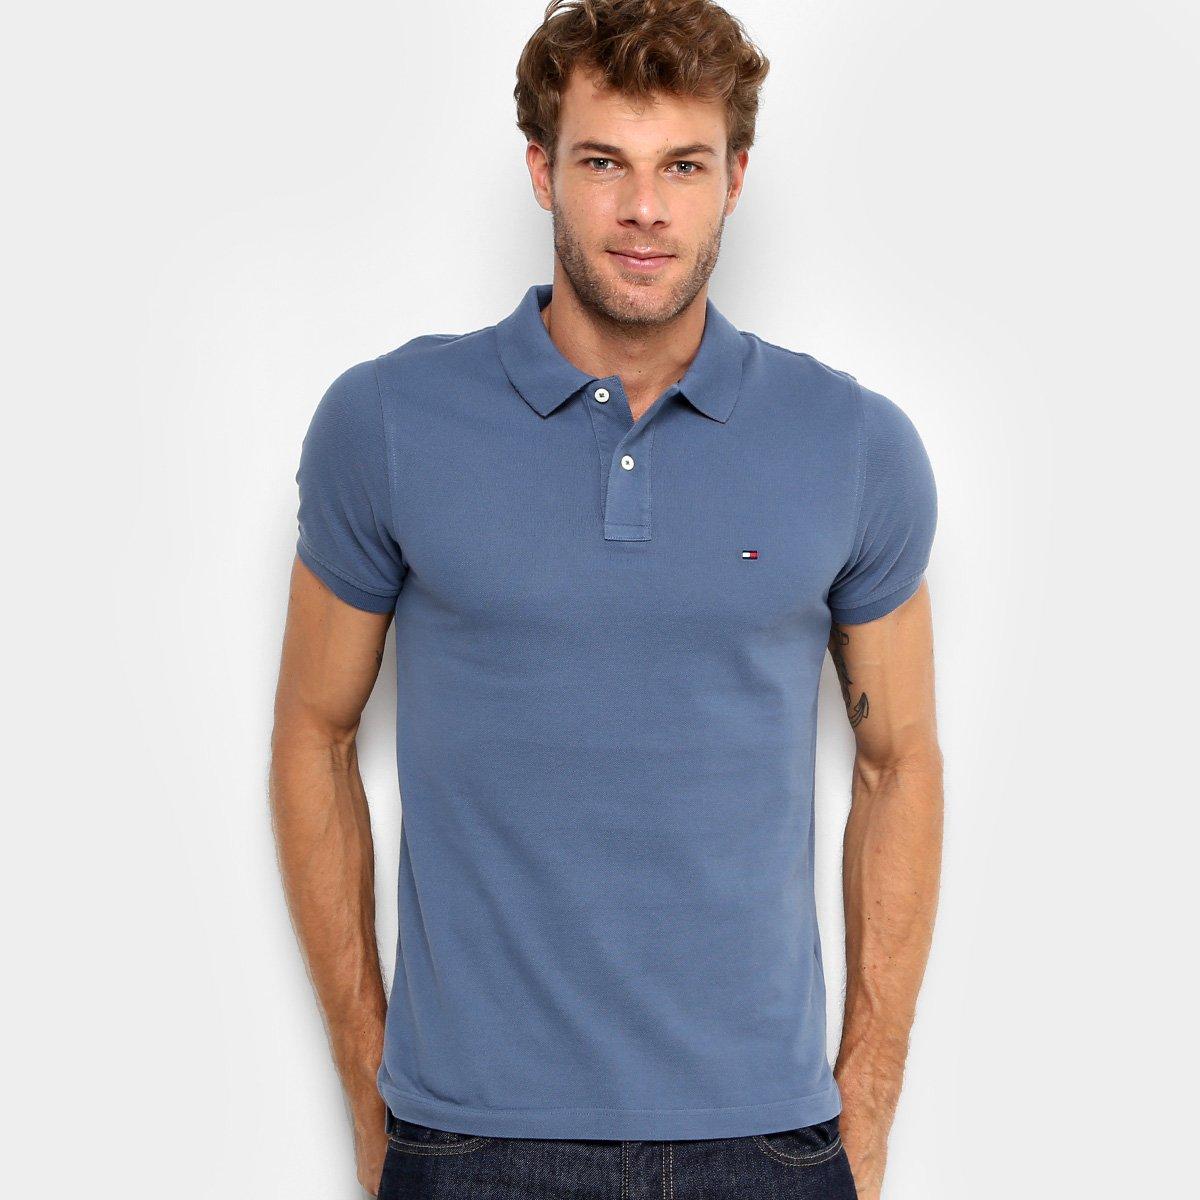 214277ac2d99d Camisa Polo Tommy Hilfiger Slim Fit Clássica Masculina - Compre Agora